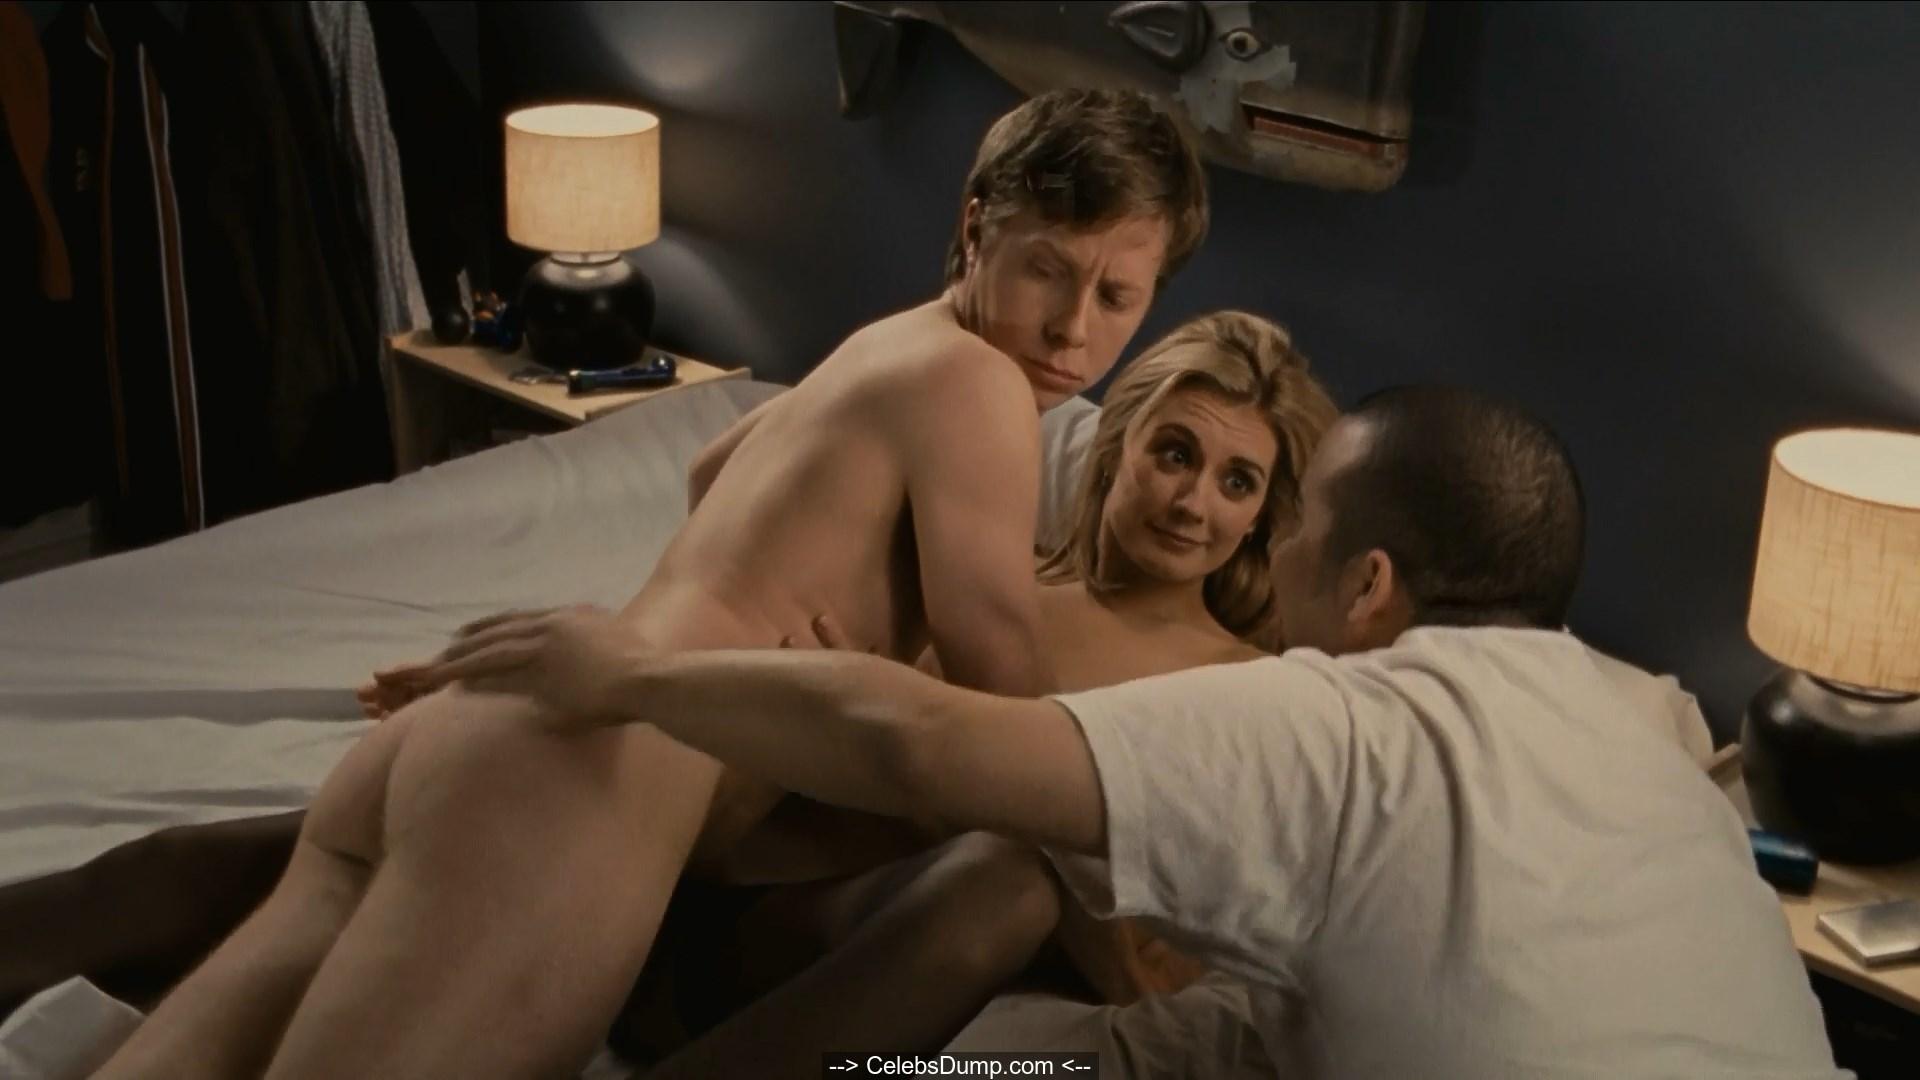 Intimacy Coordinator Reveals Dark Secrets Of Hollywood Sex Scenes